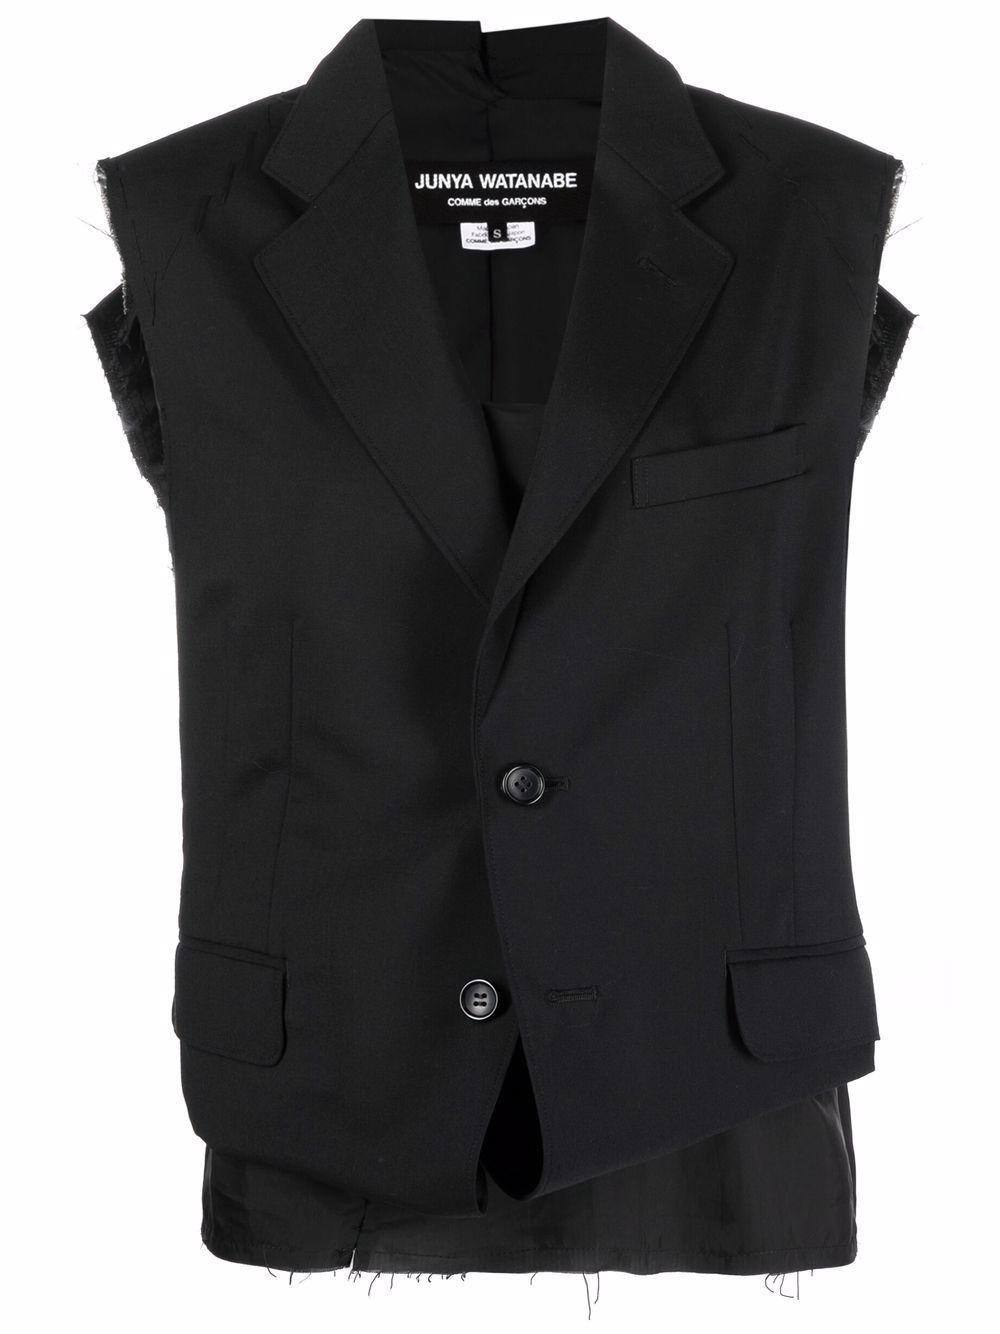 giacca smanicata + top pezzo unico JUNYA WATANABE | Giacca | JG-J012-0511